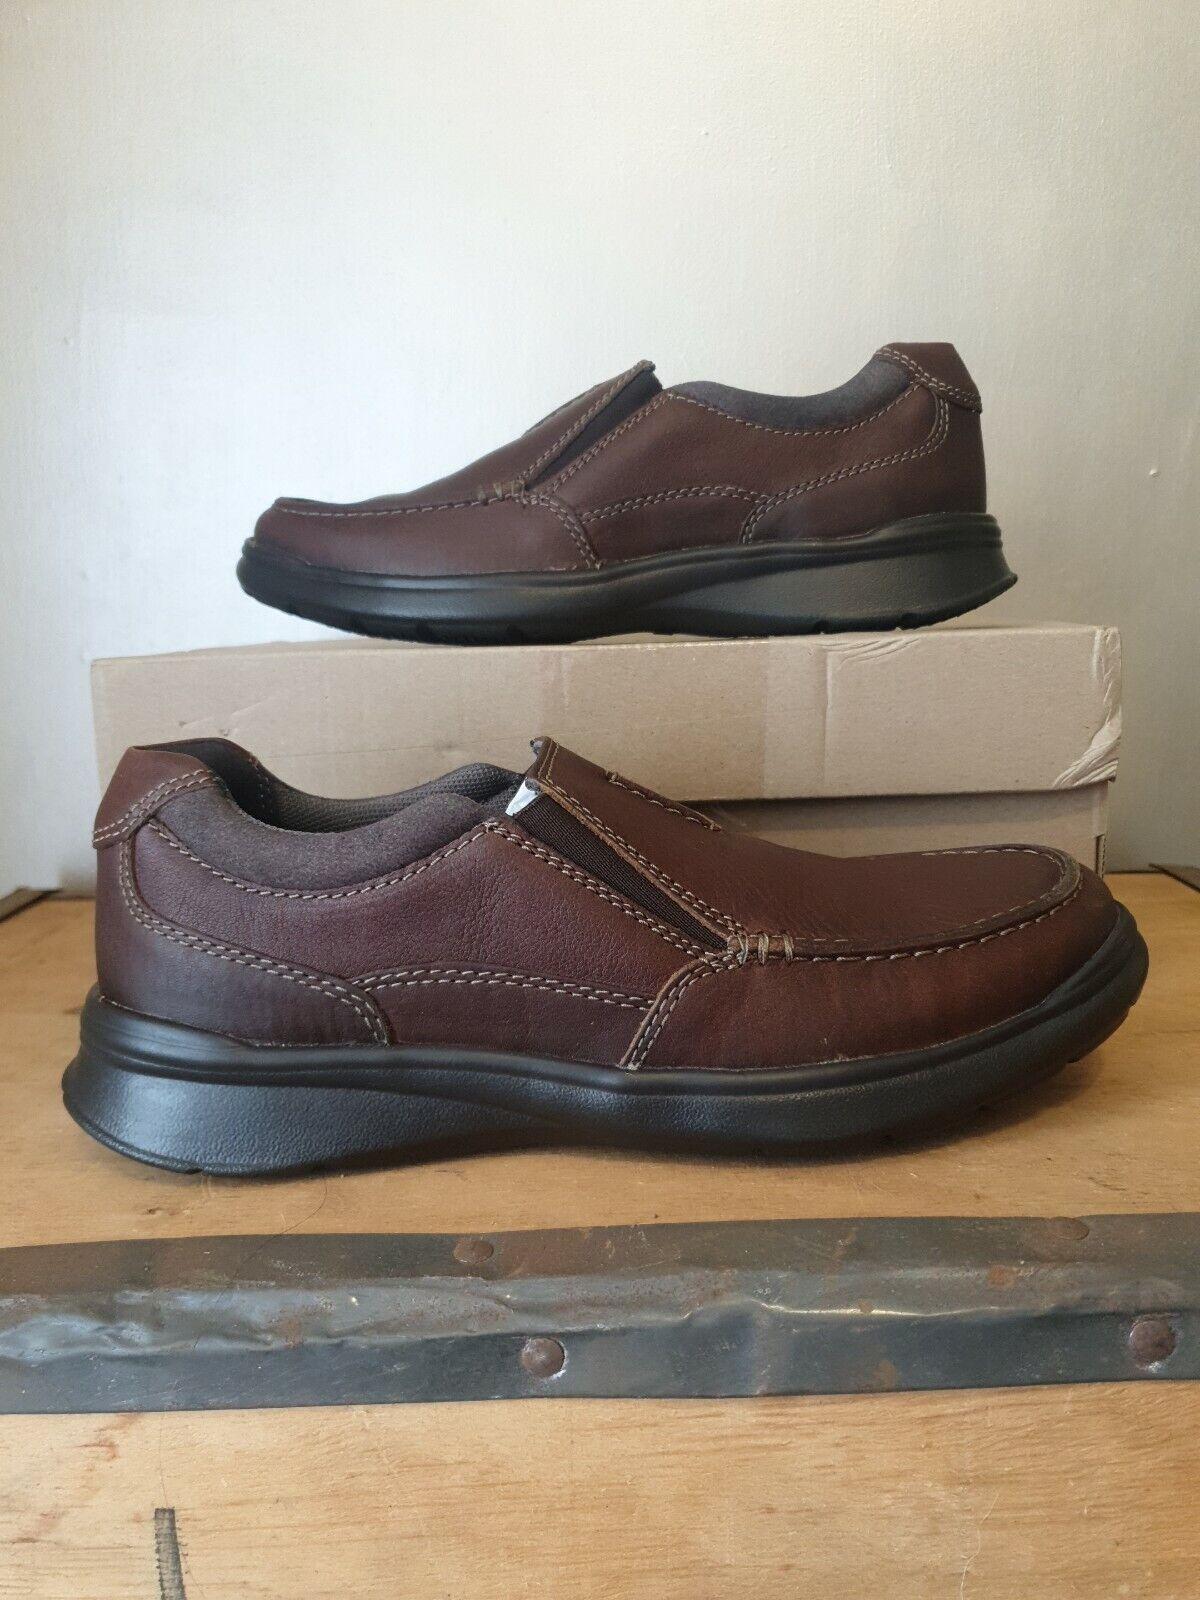 Clarks Mens leather cottrel slip shoe in Tobacco size 6 new in box